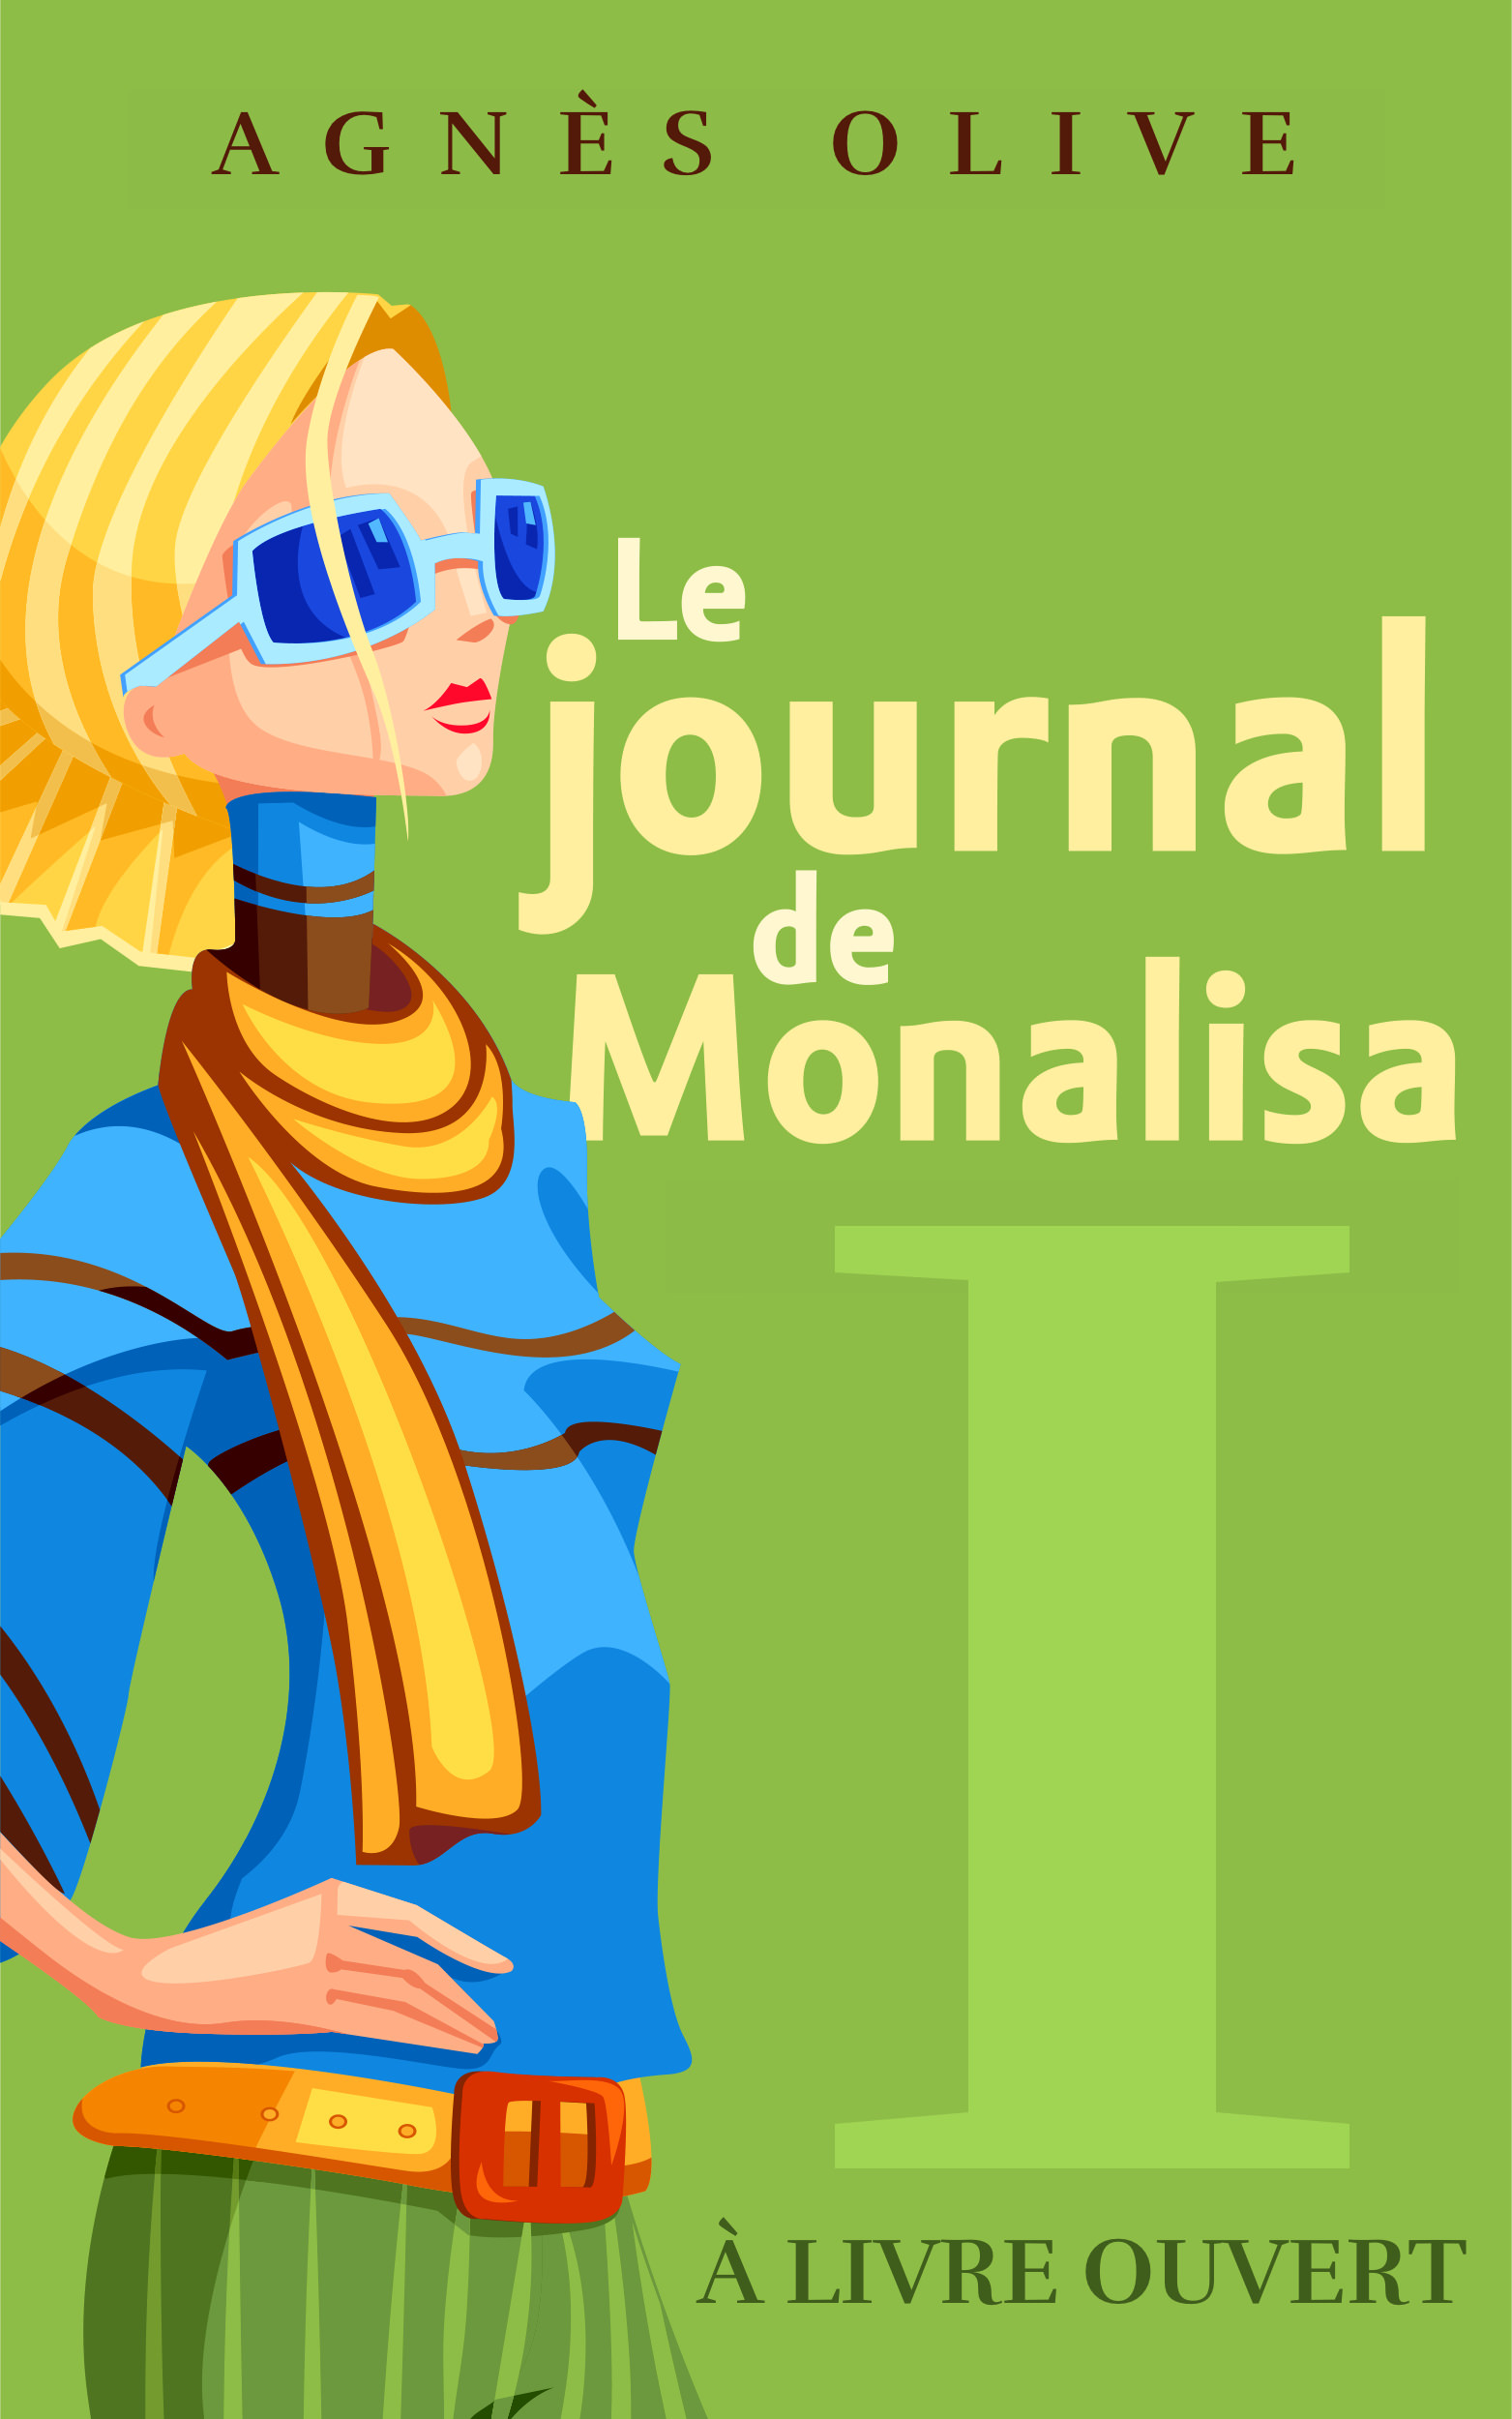 image le journal de monalisa